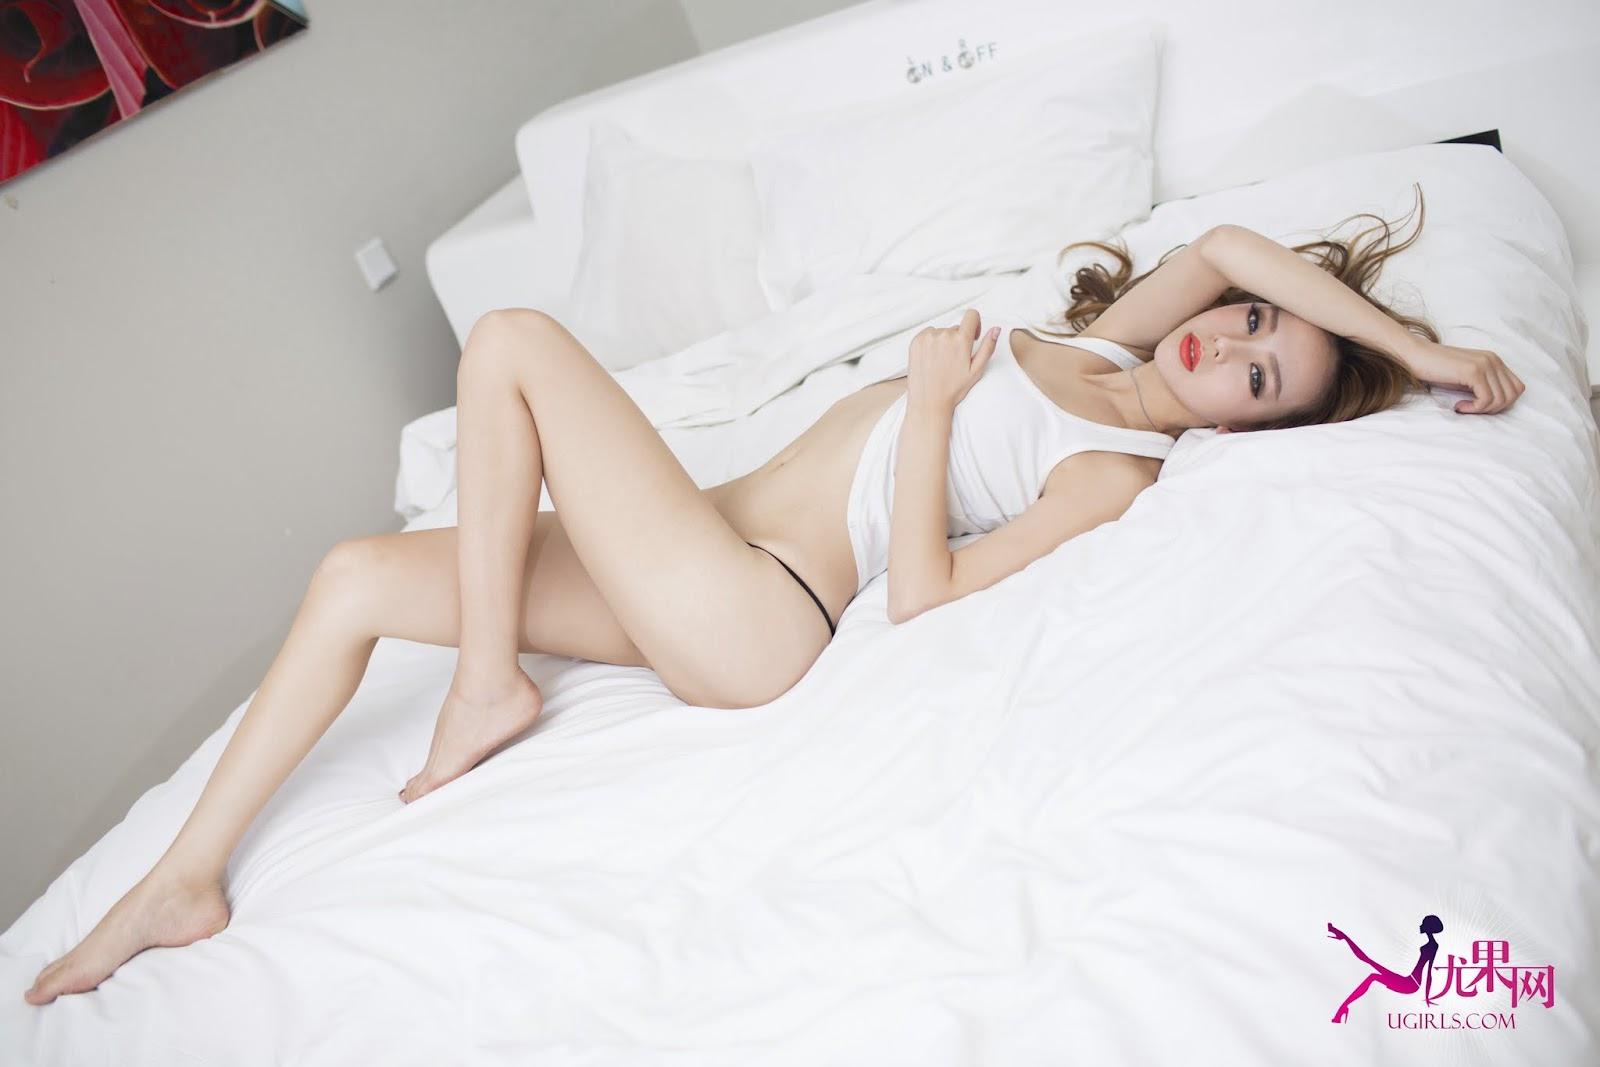 U091%2B%252847%2529 - Sexy Photo UGIRLS NO.91 Nude Girl